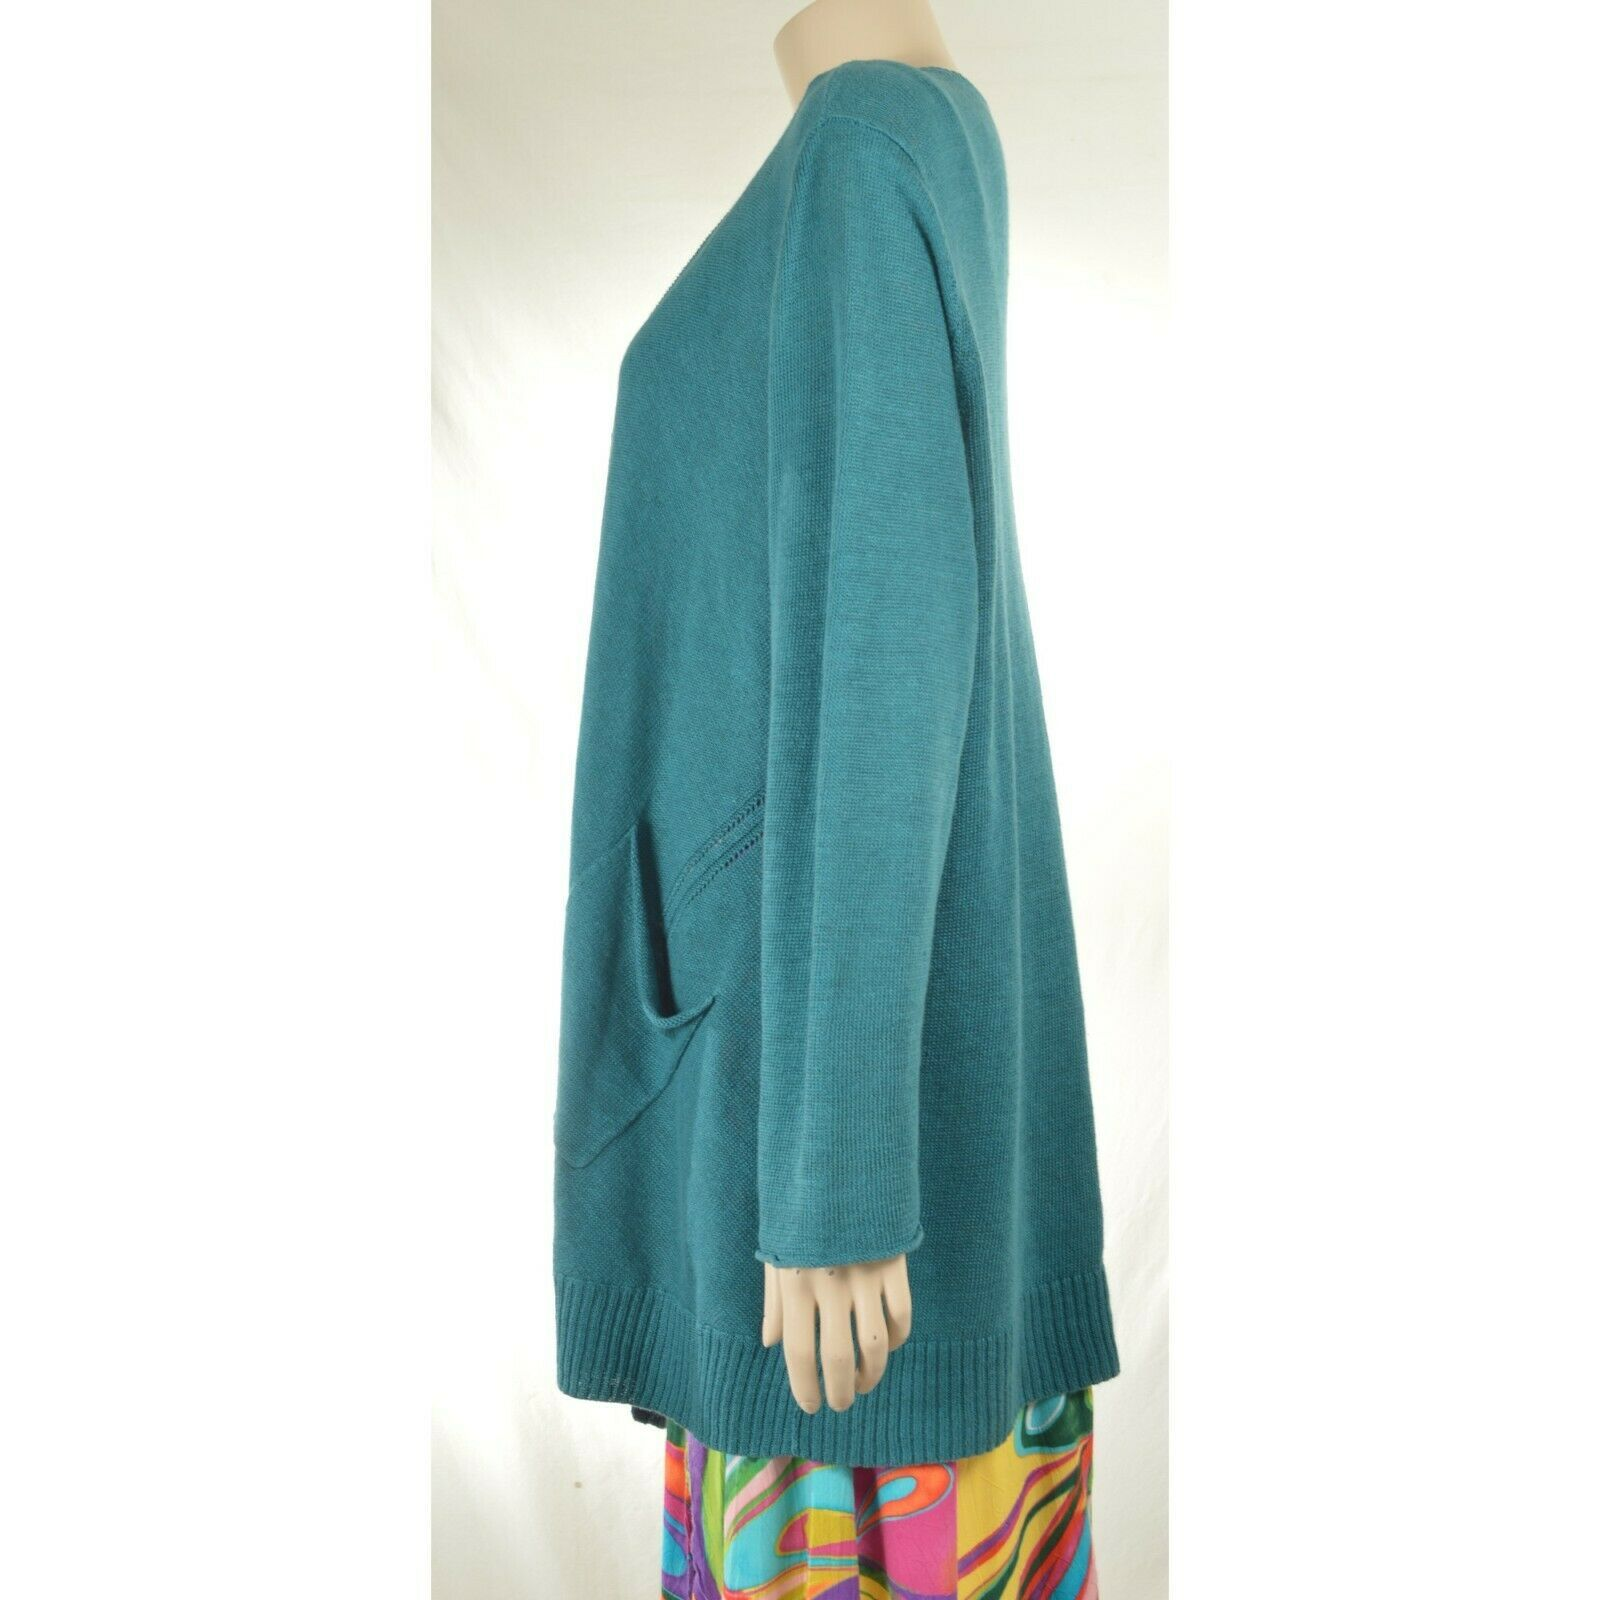 Eileen Fisher sweater cardigan SZ L teal 100% linen knit pockets soft long s image 2